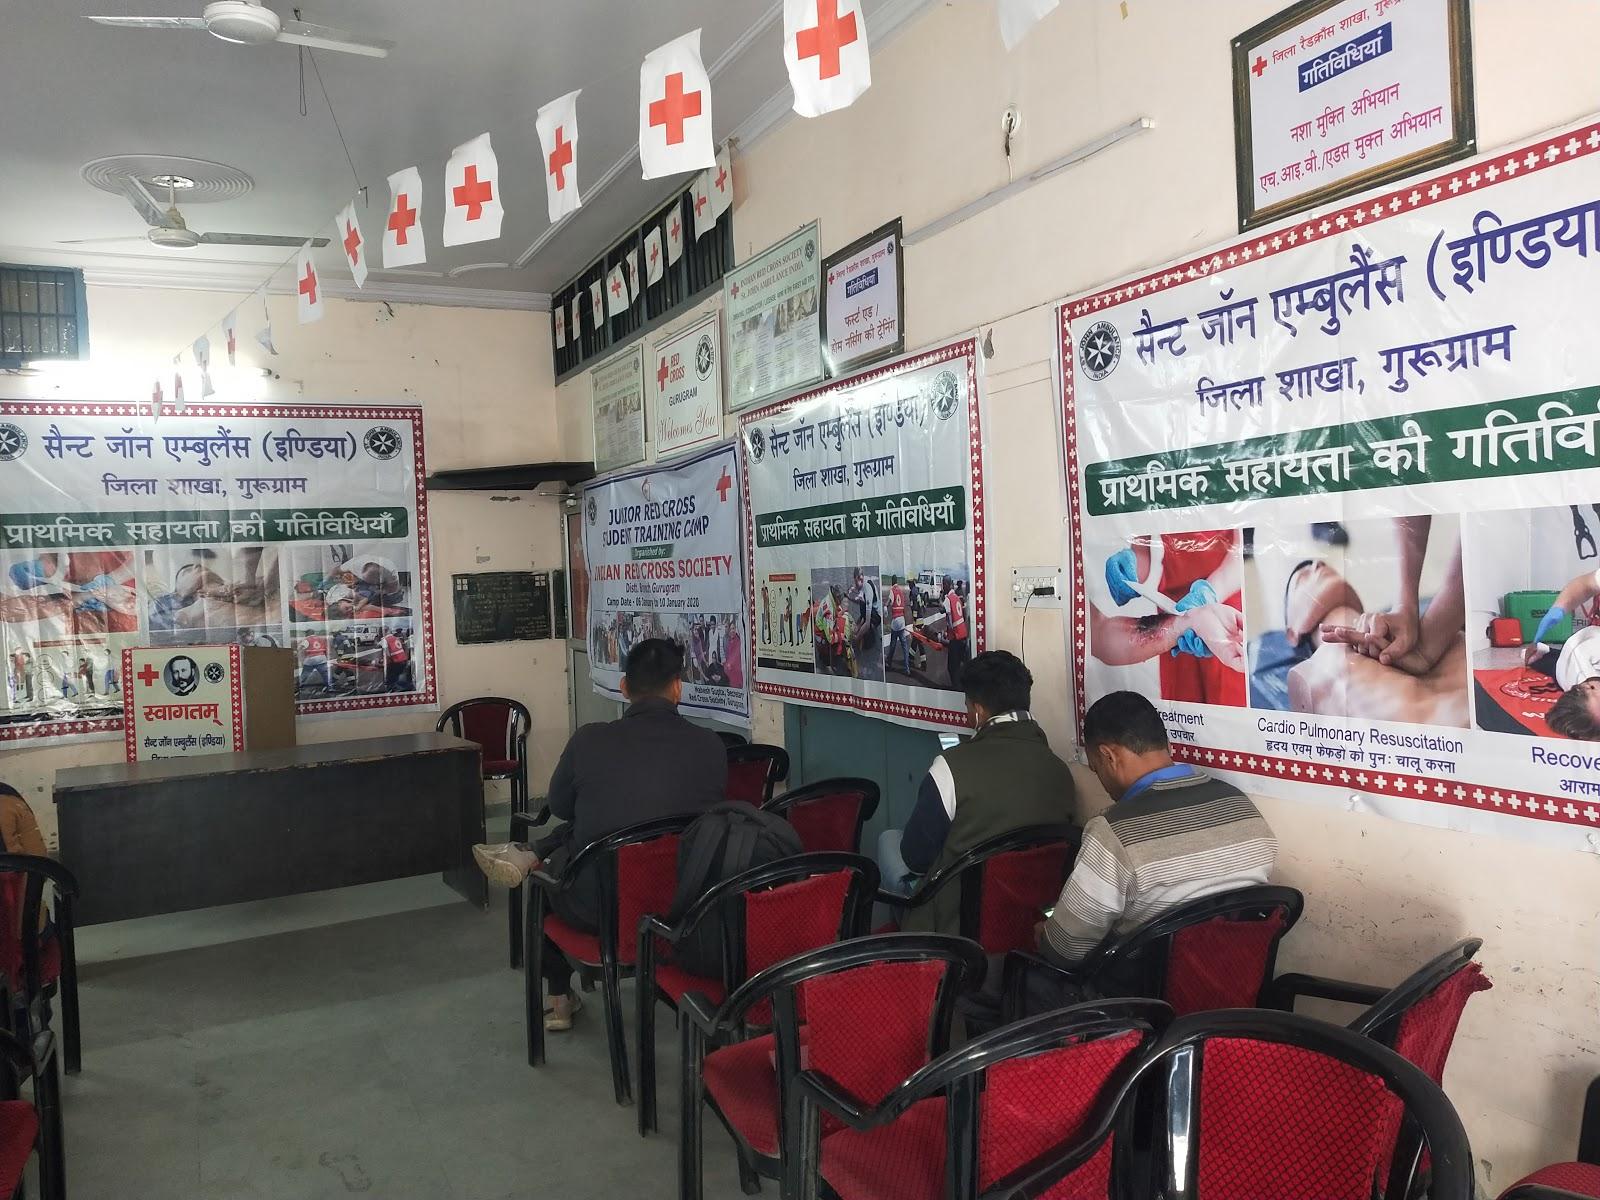 blood bank Indian Red Cross Society near Gurugram Haryana